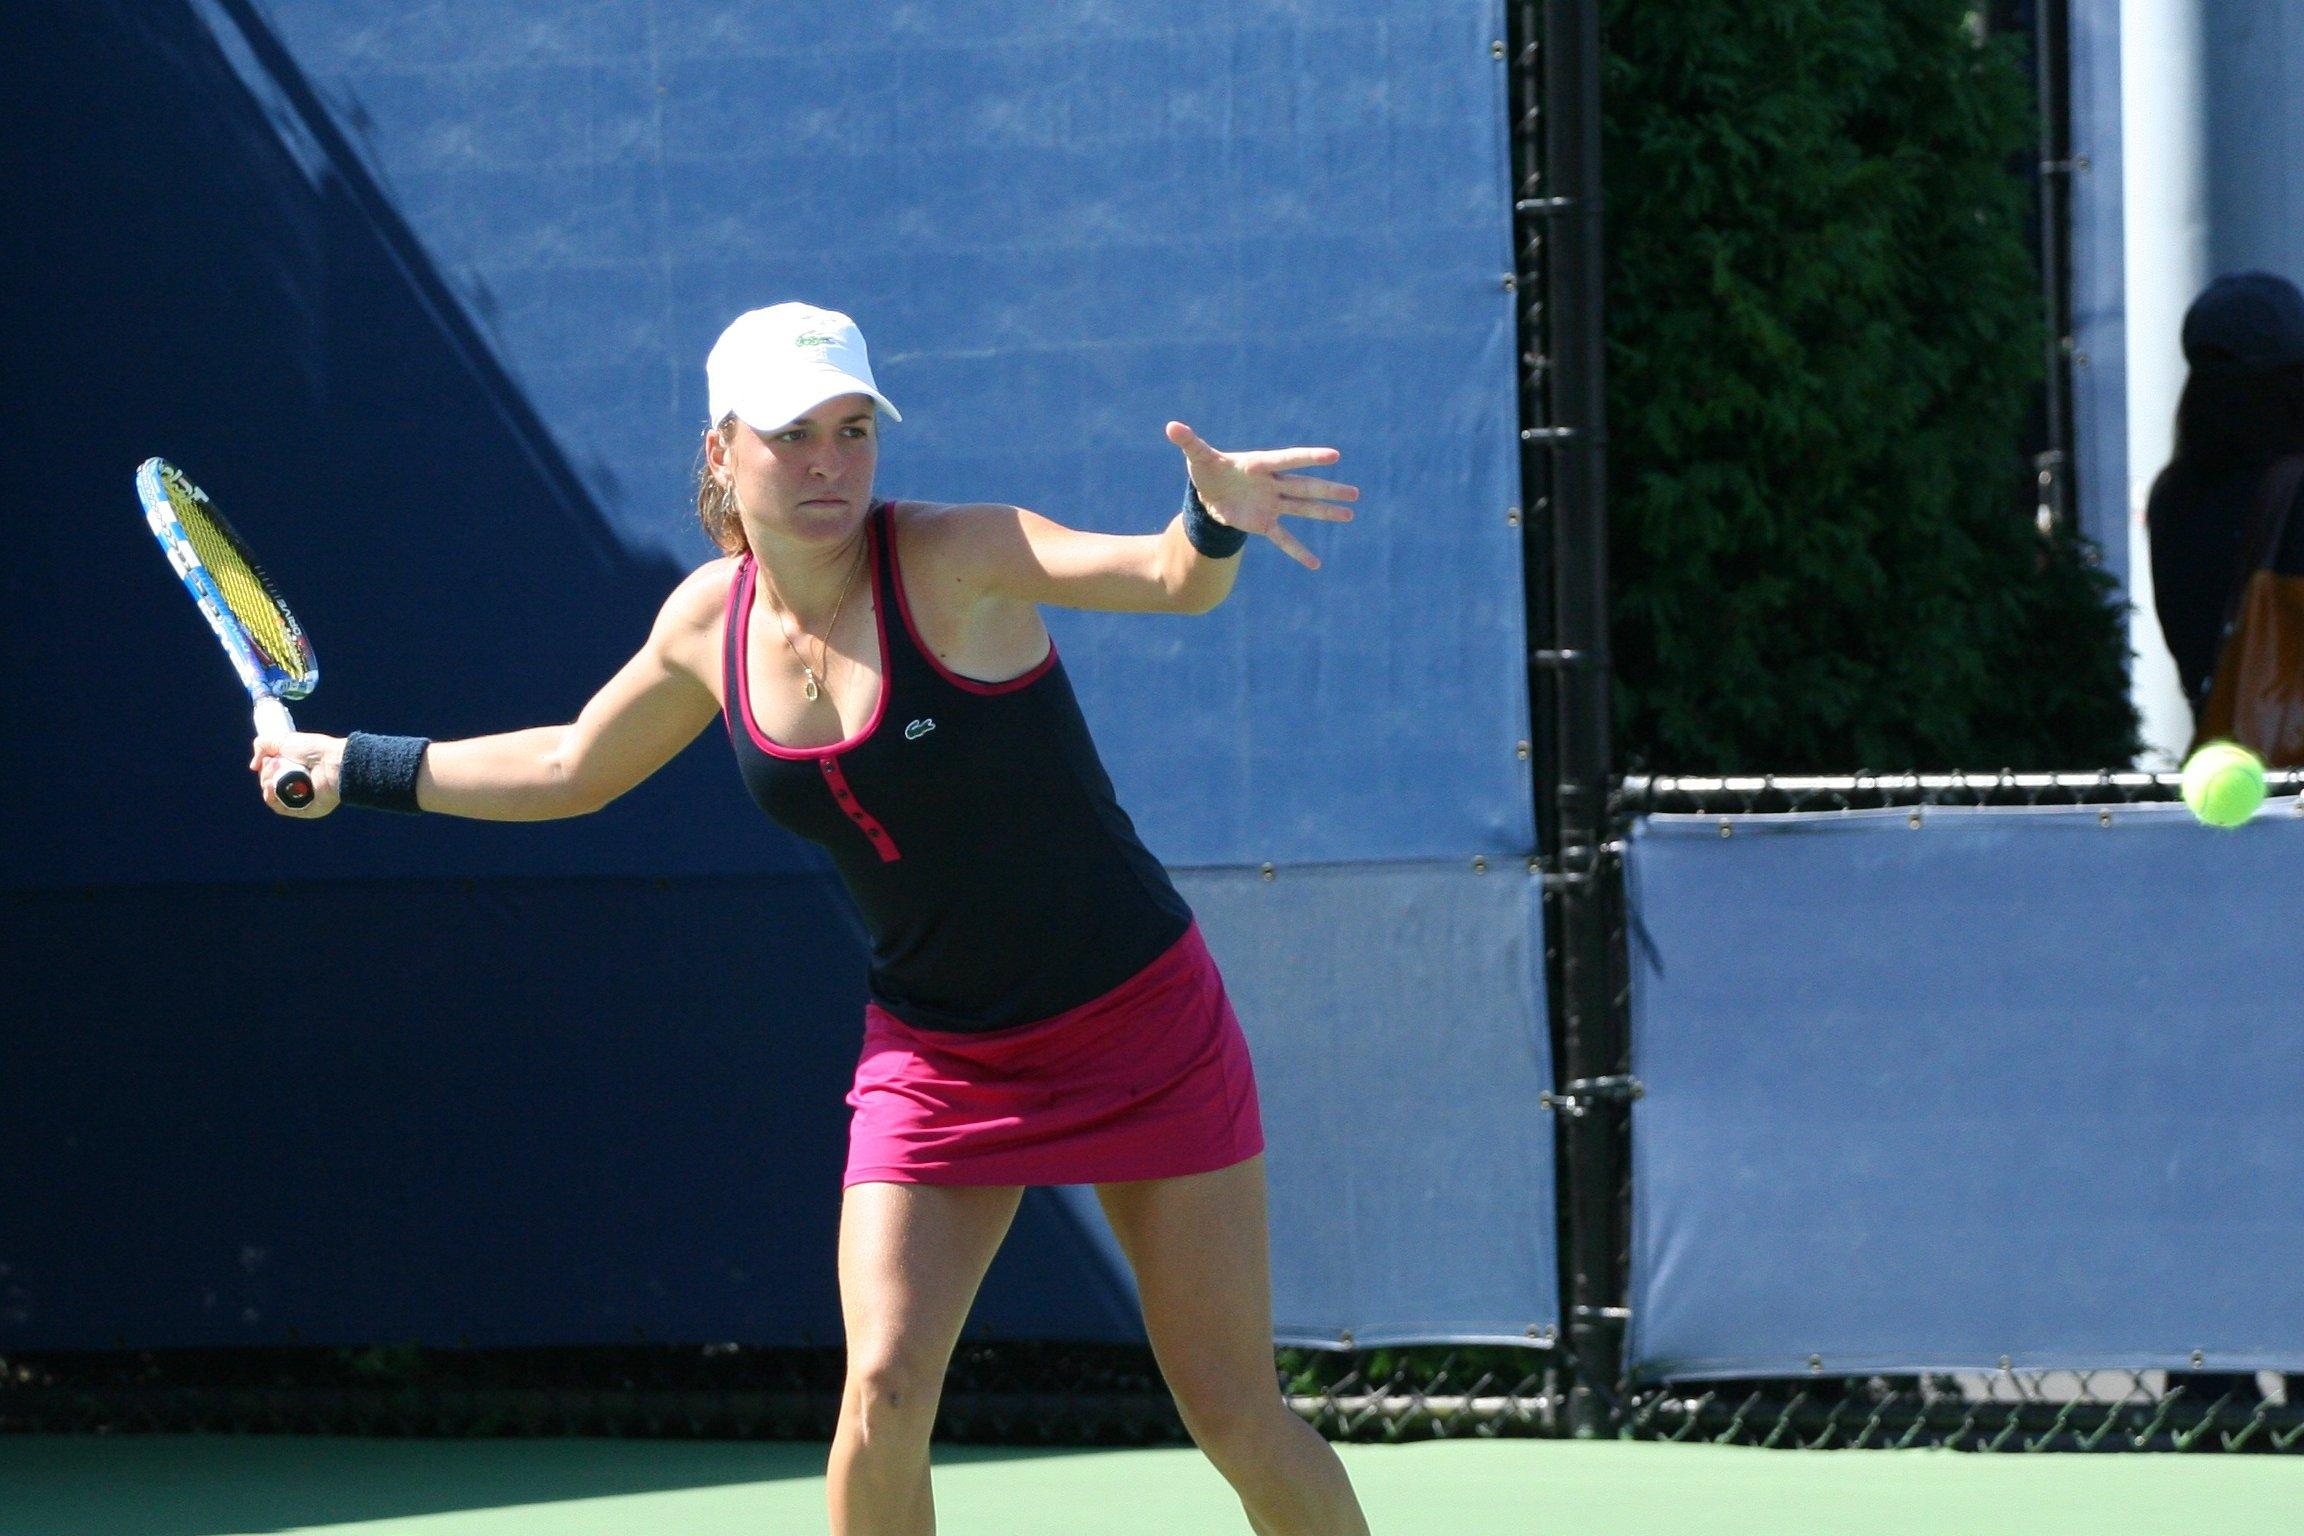 Venus Williams begins Wimbledon 2011 with win over Akgul ...